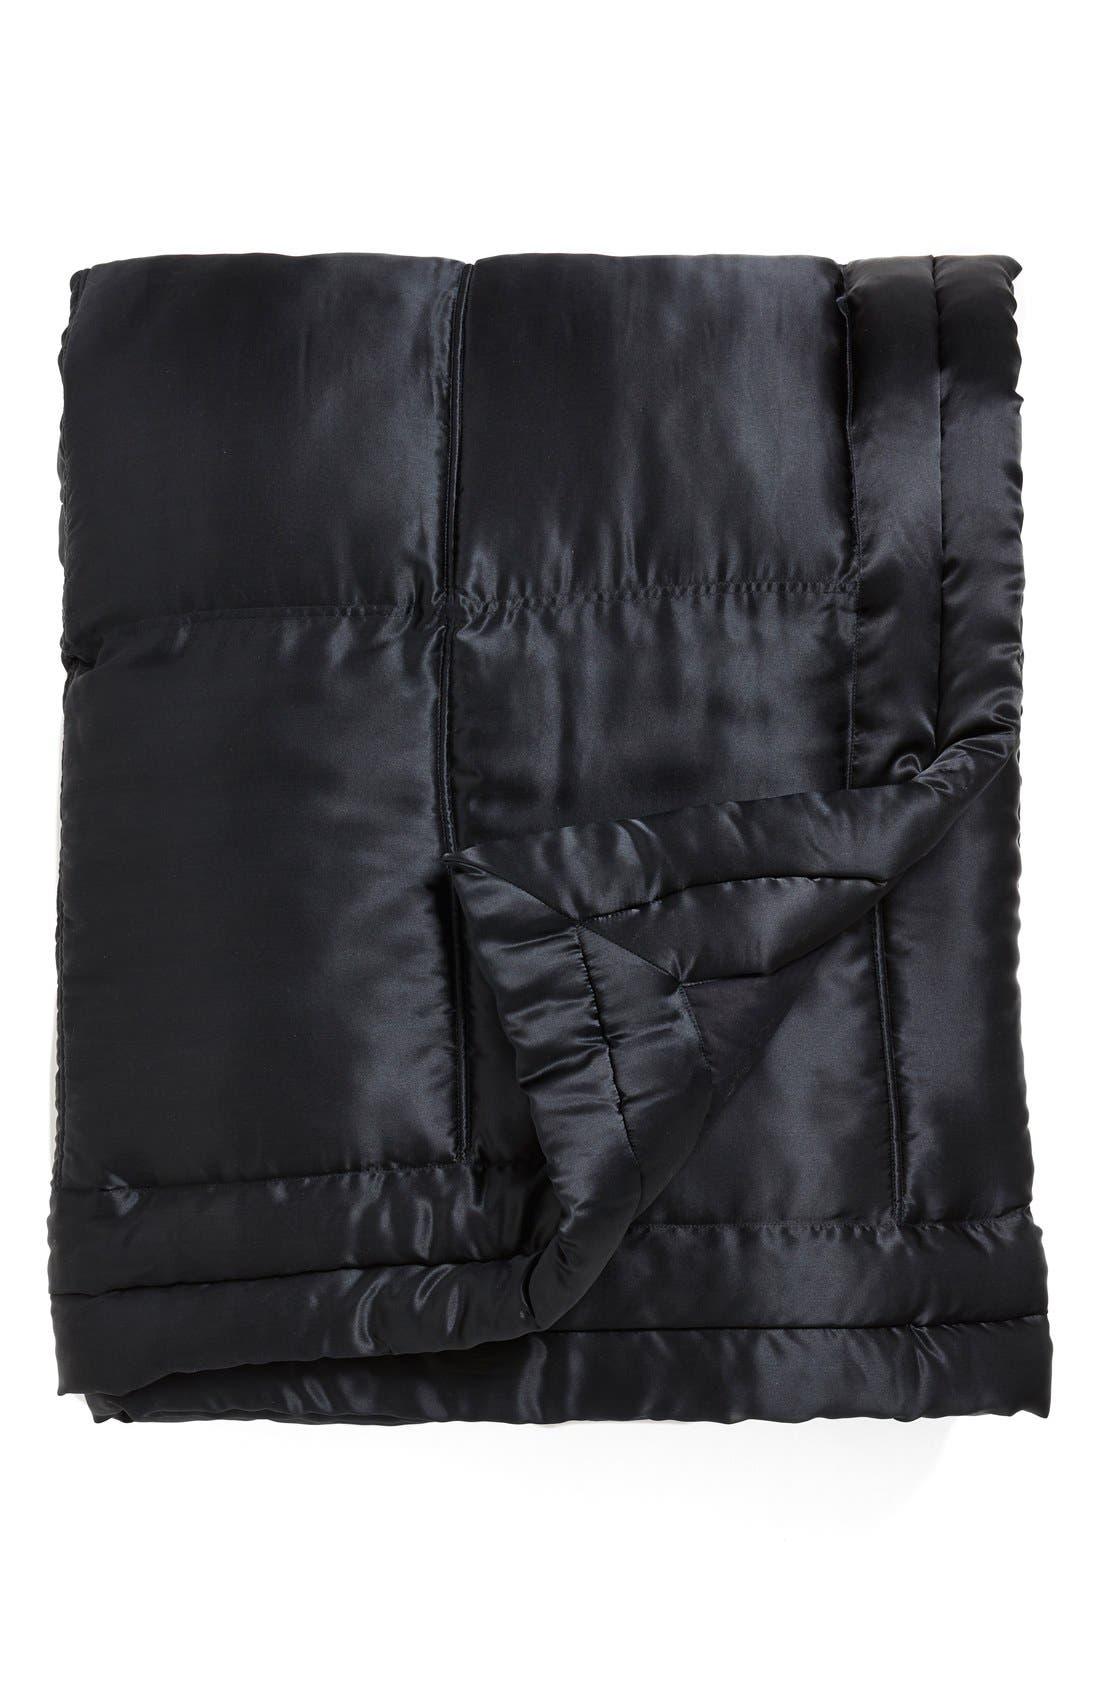 Donna Karan Collection 'Impression' Silk Charmeuse Quilt,                             Main thumbnail 1, color,                             004